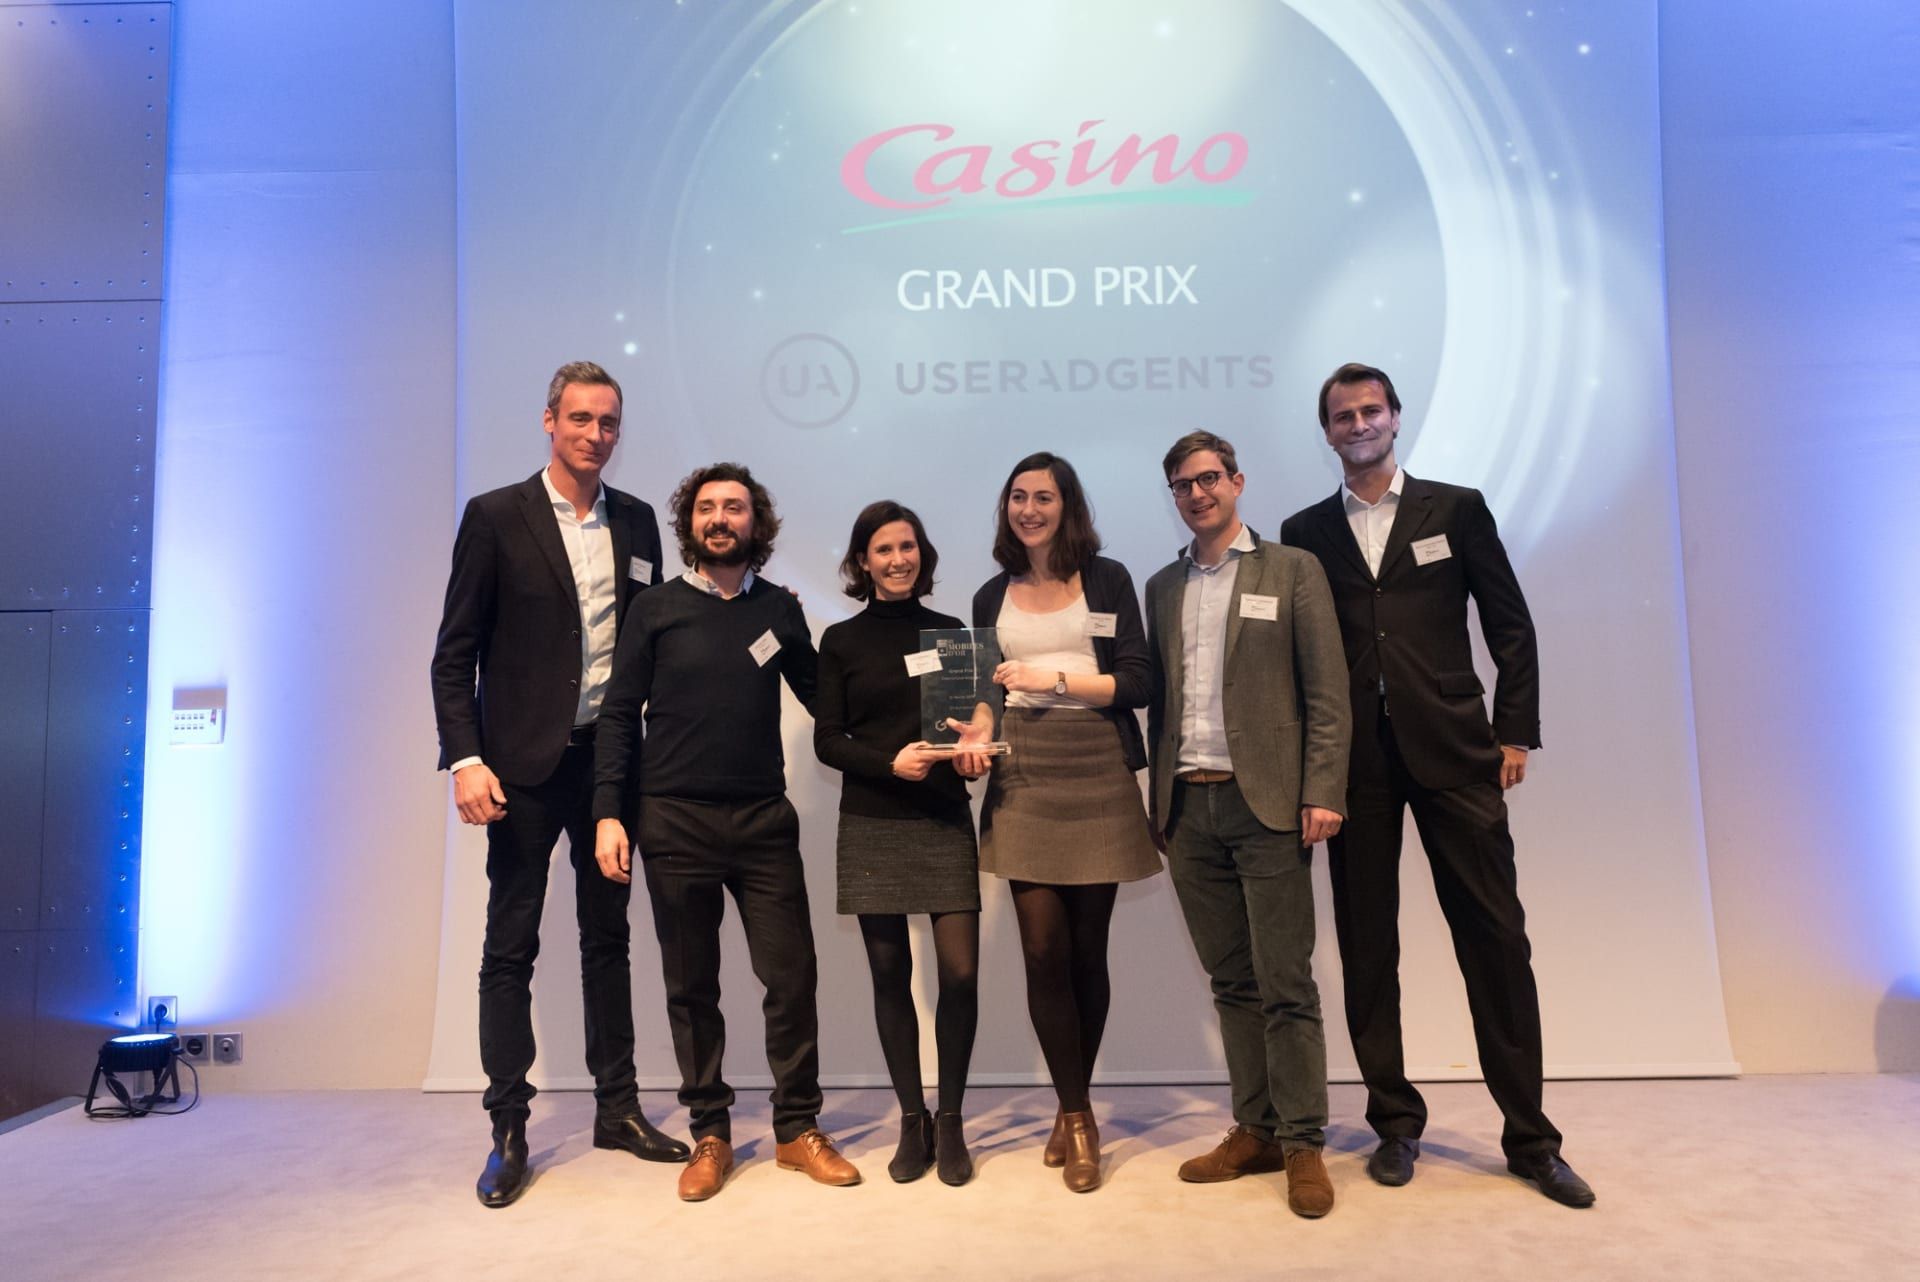 grand prix useradgents casino